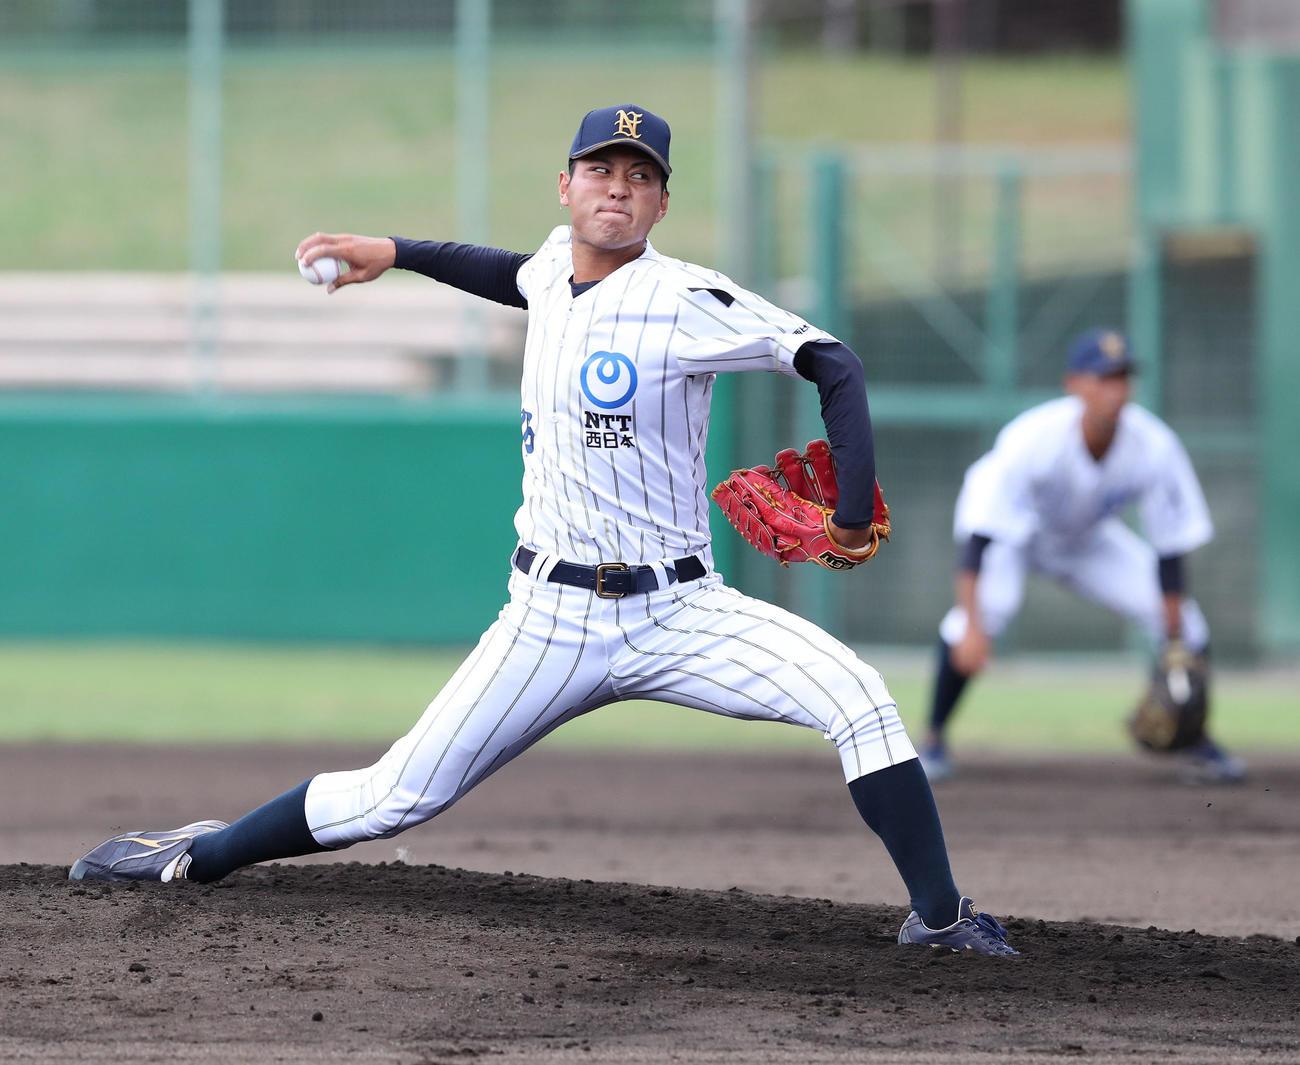 NTT西日本対NOMOベースボールクラブ 喪章をつけて先発するNTT西日本・大江(撮影・白石智彦)